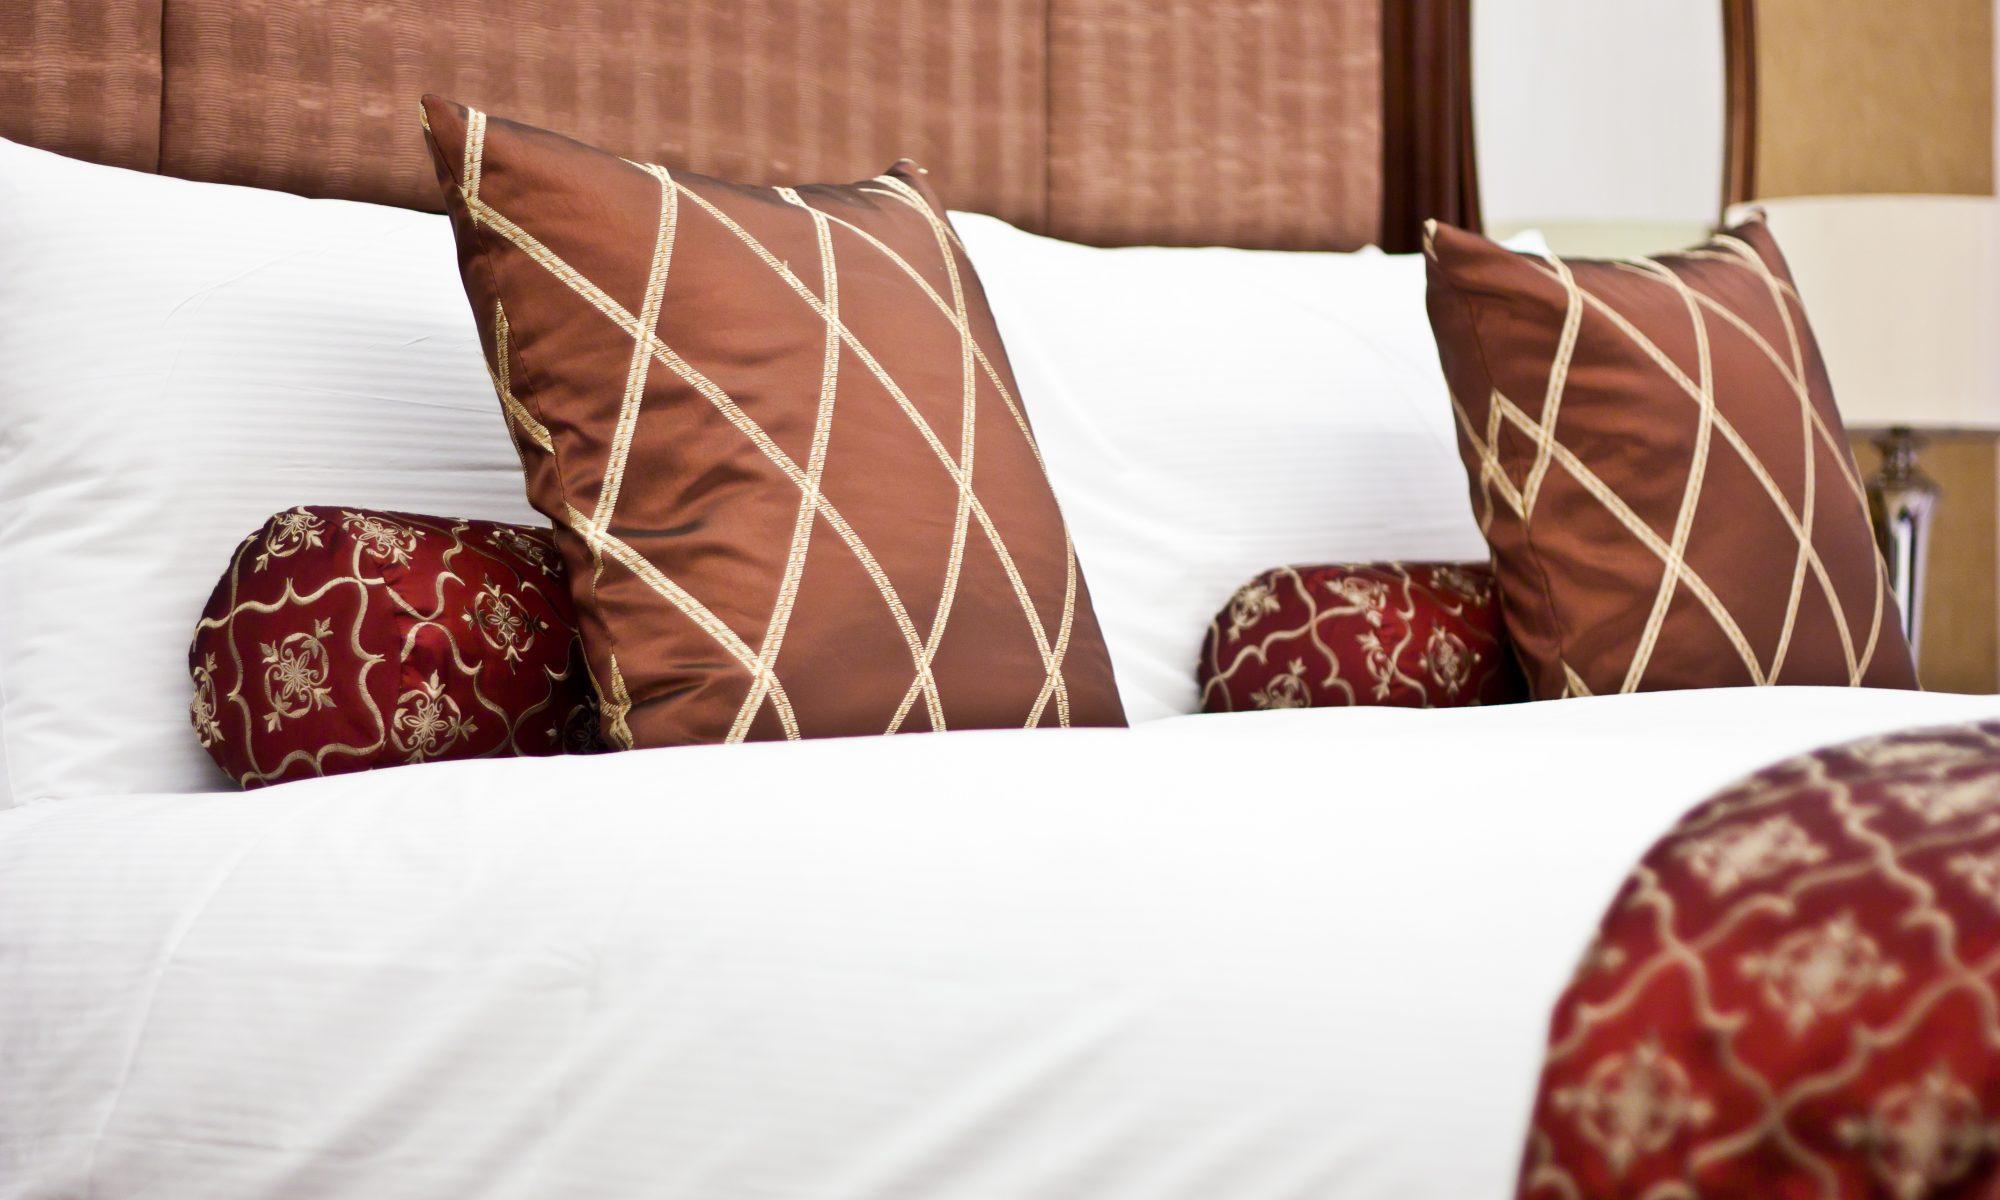 Best mattress for new apartment